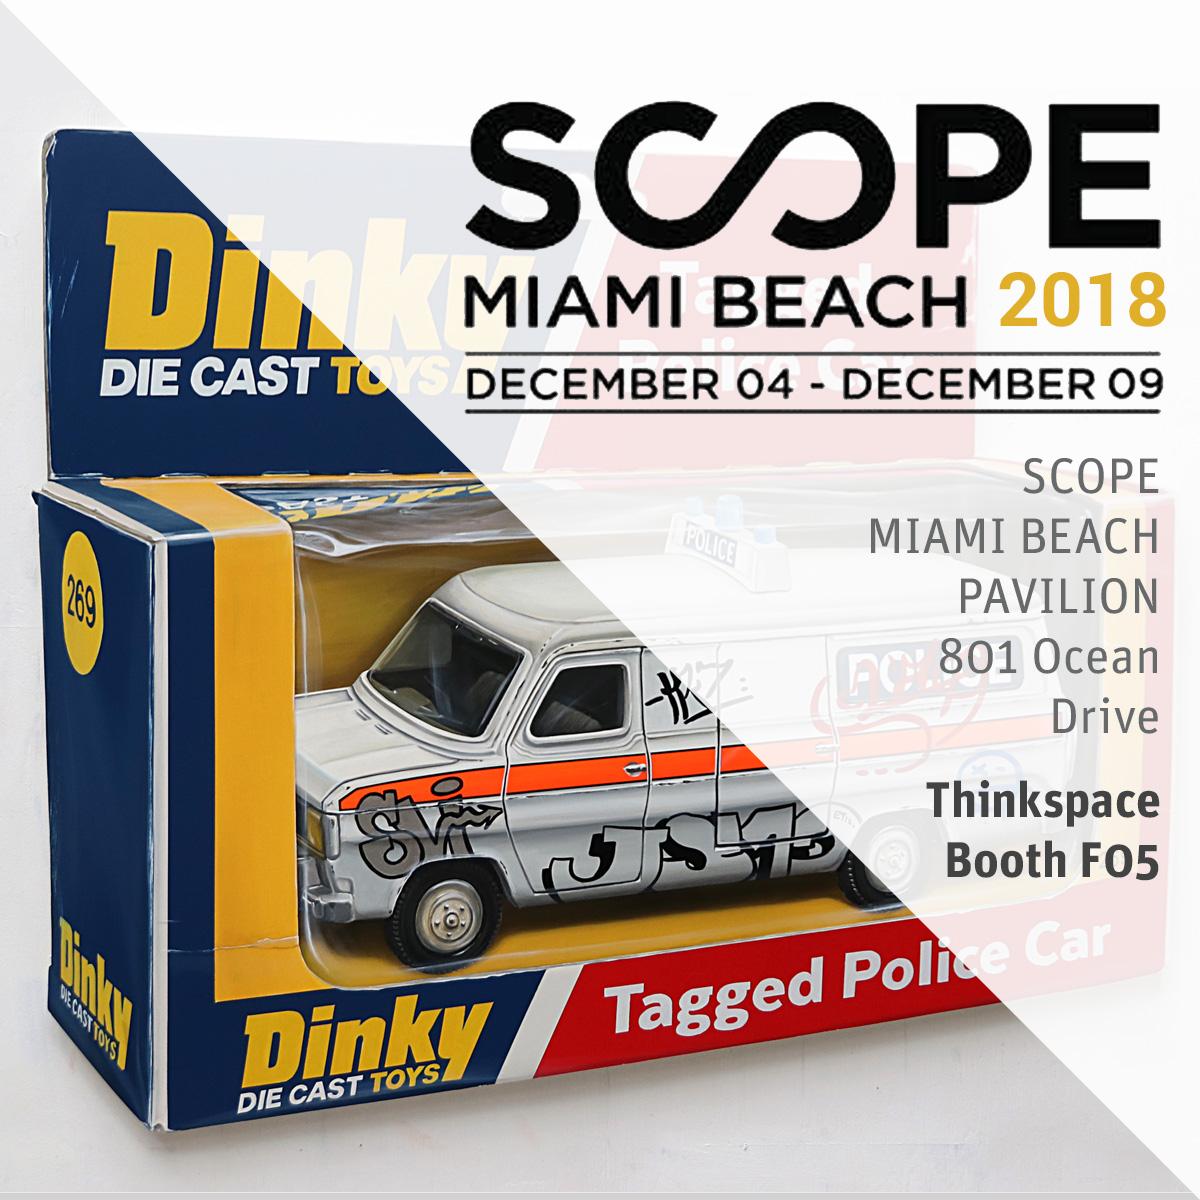 Scope Art Miami Beach 2018 Leon Keer